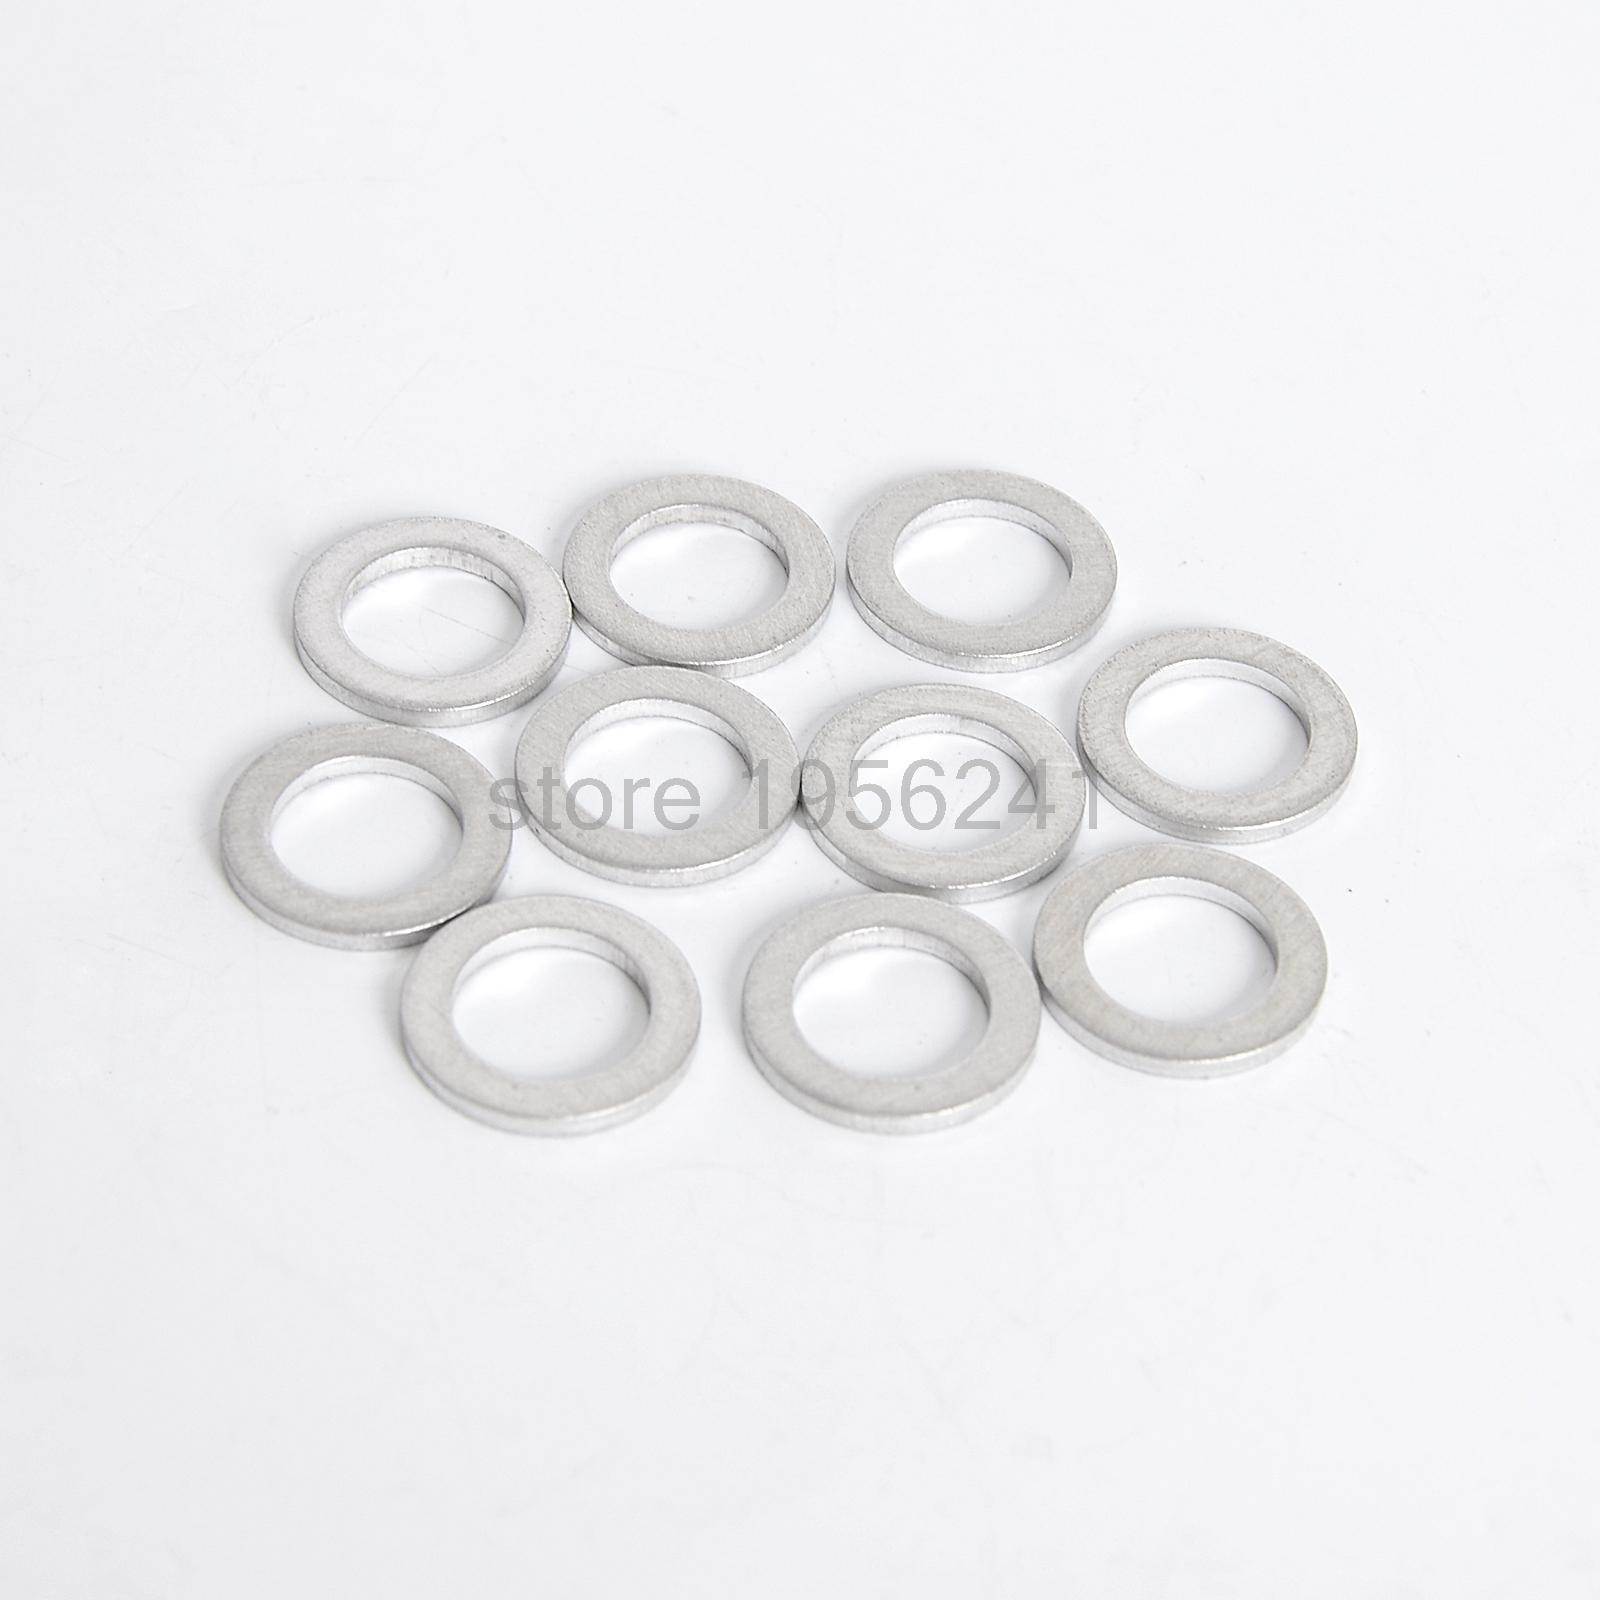 Washer Drain Honda 14mm 94109-14000 Qty 10